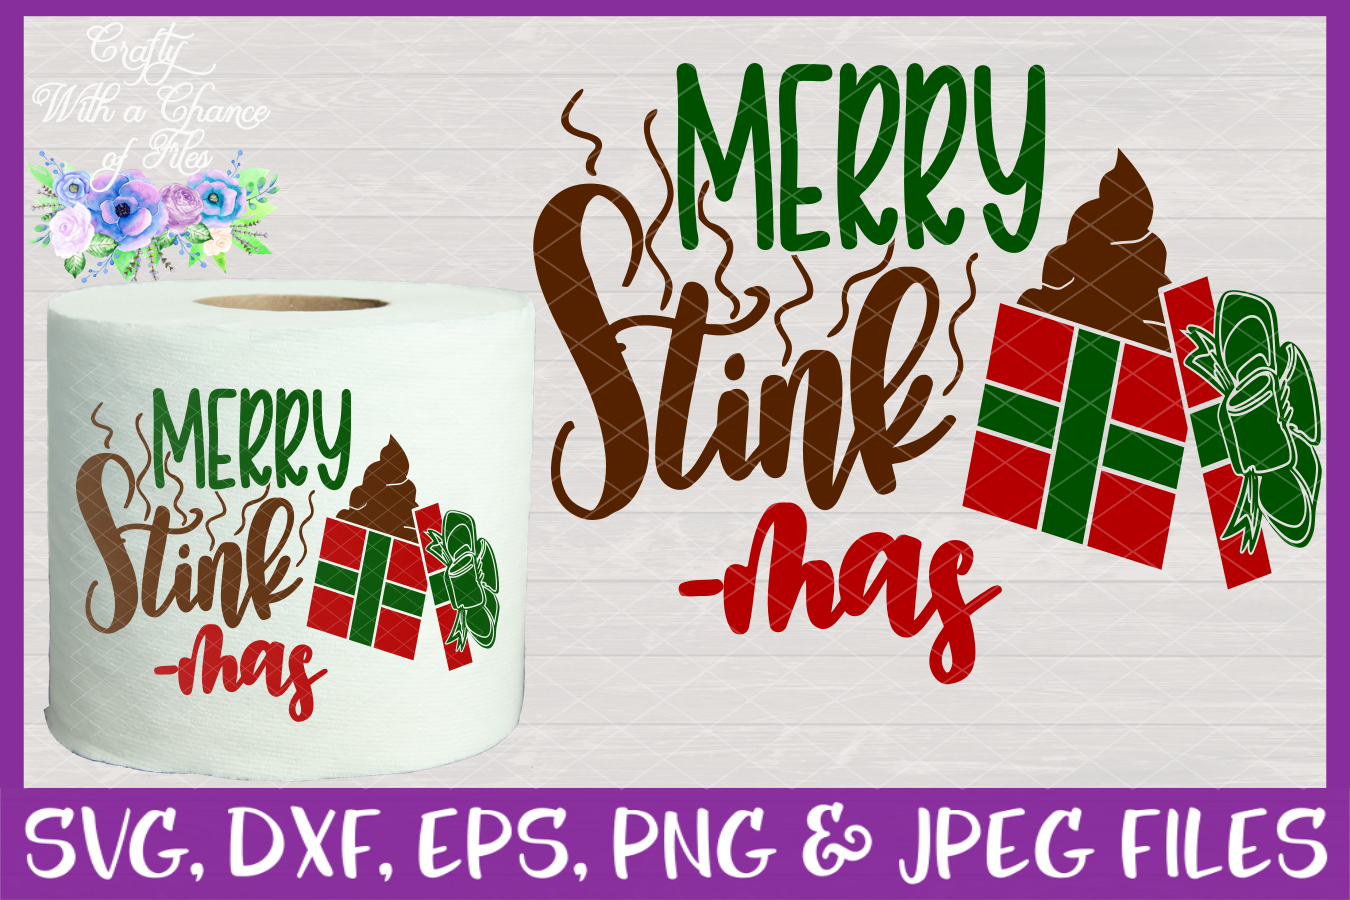 Merry Stinkmas SVG - Christmas Toilet Paper Design example image 1